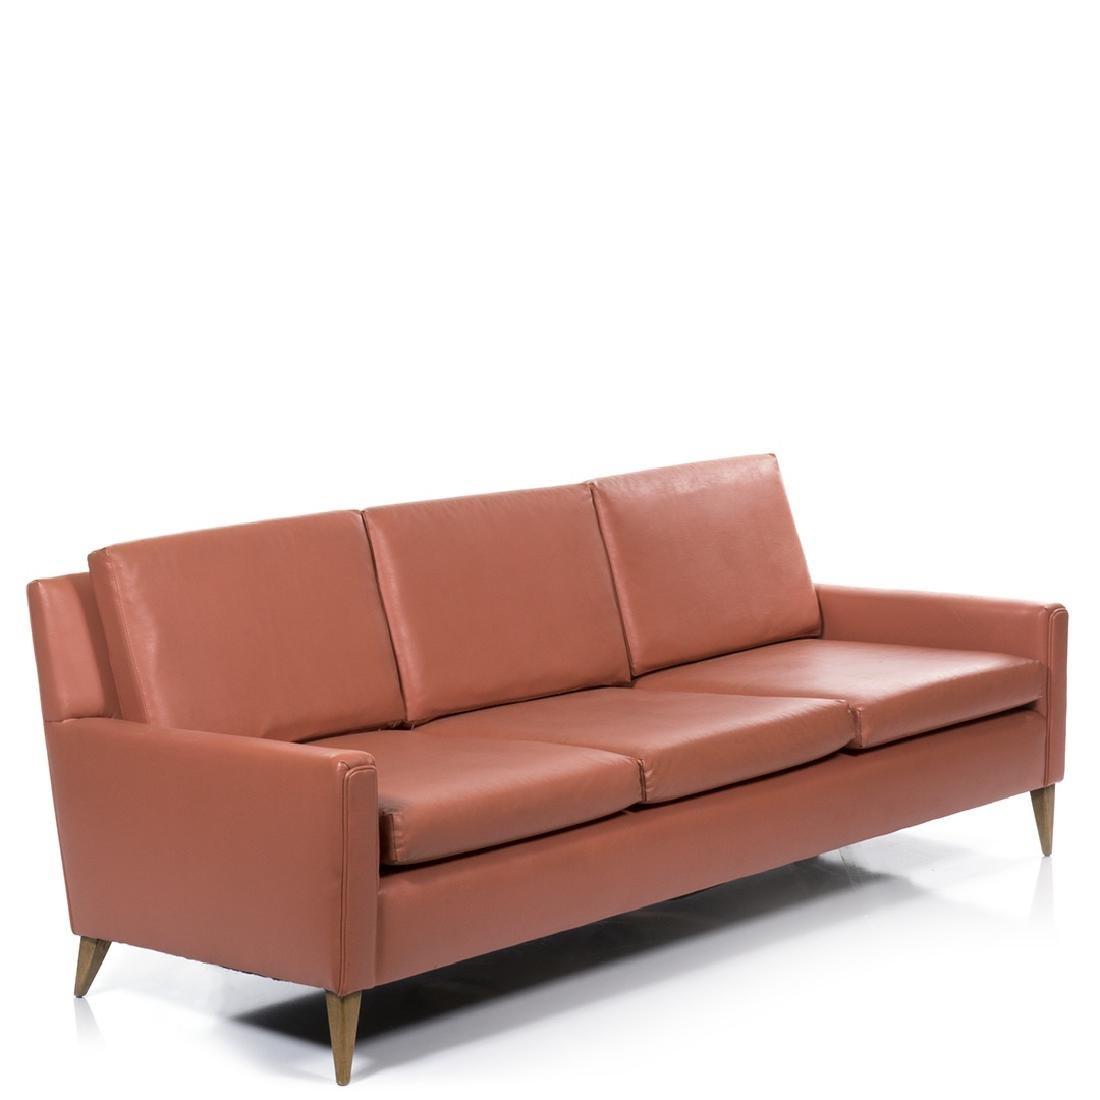 Paul McCobb Sofa - 3